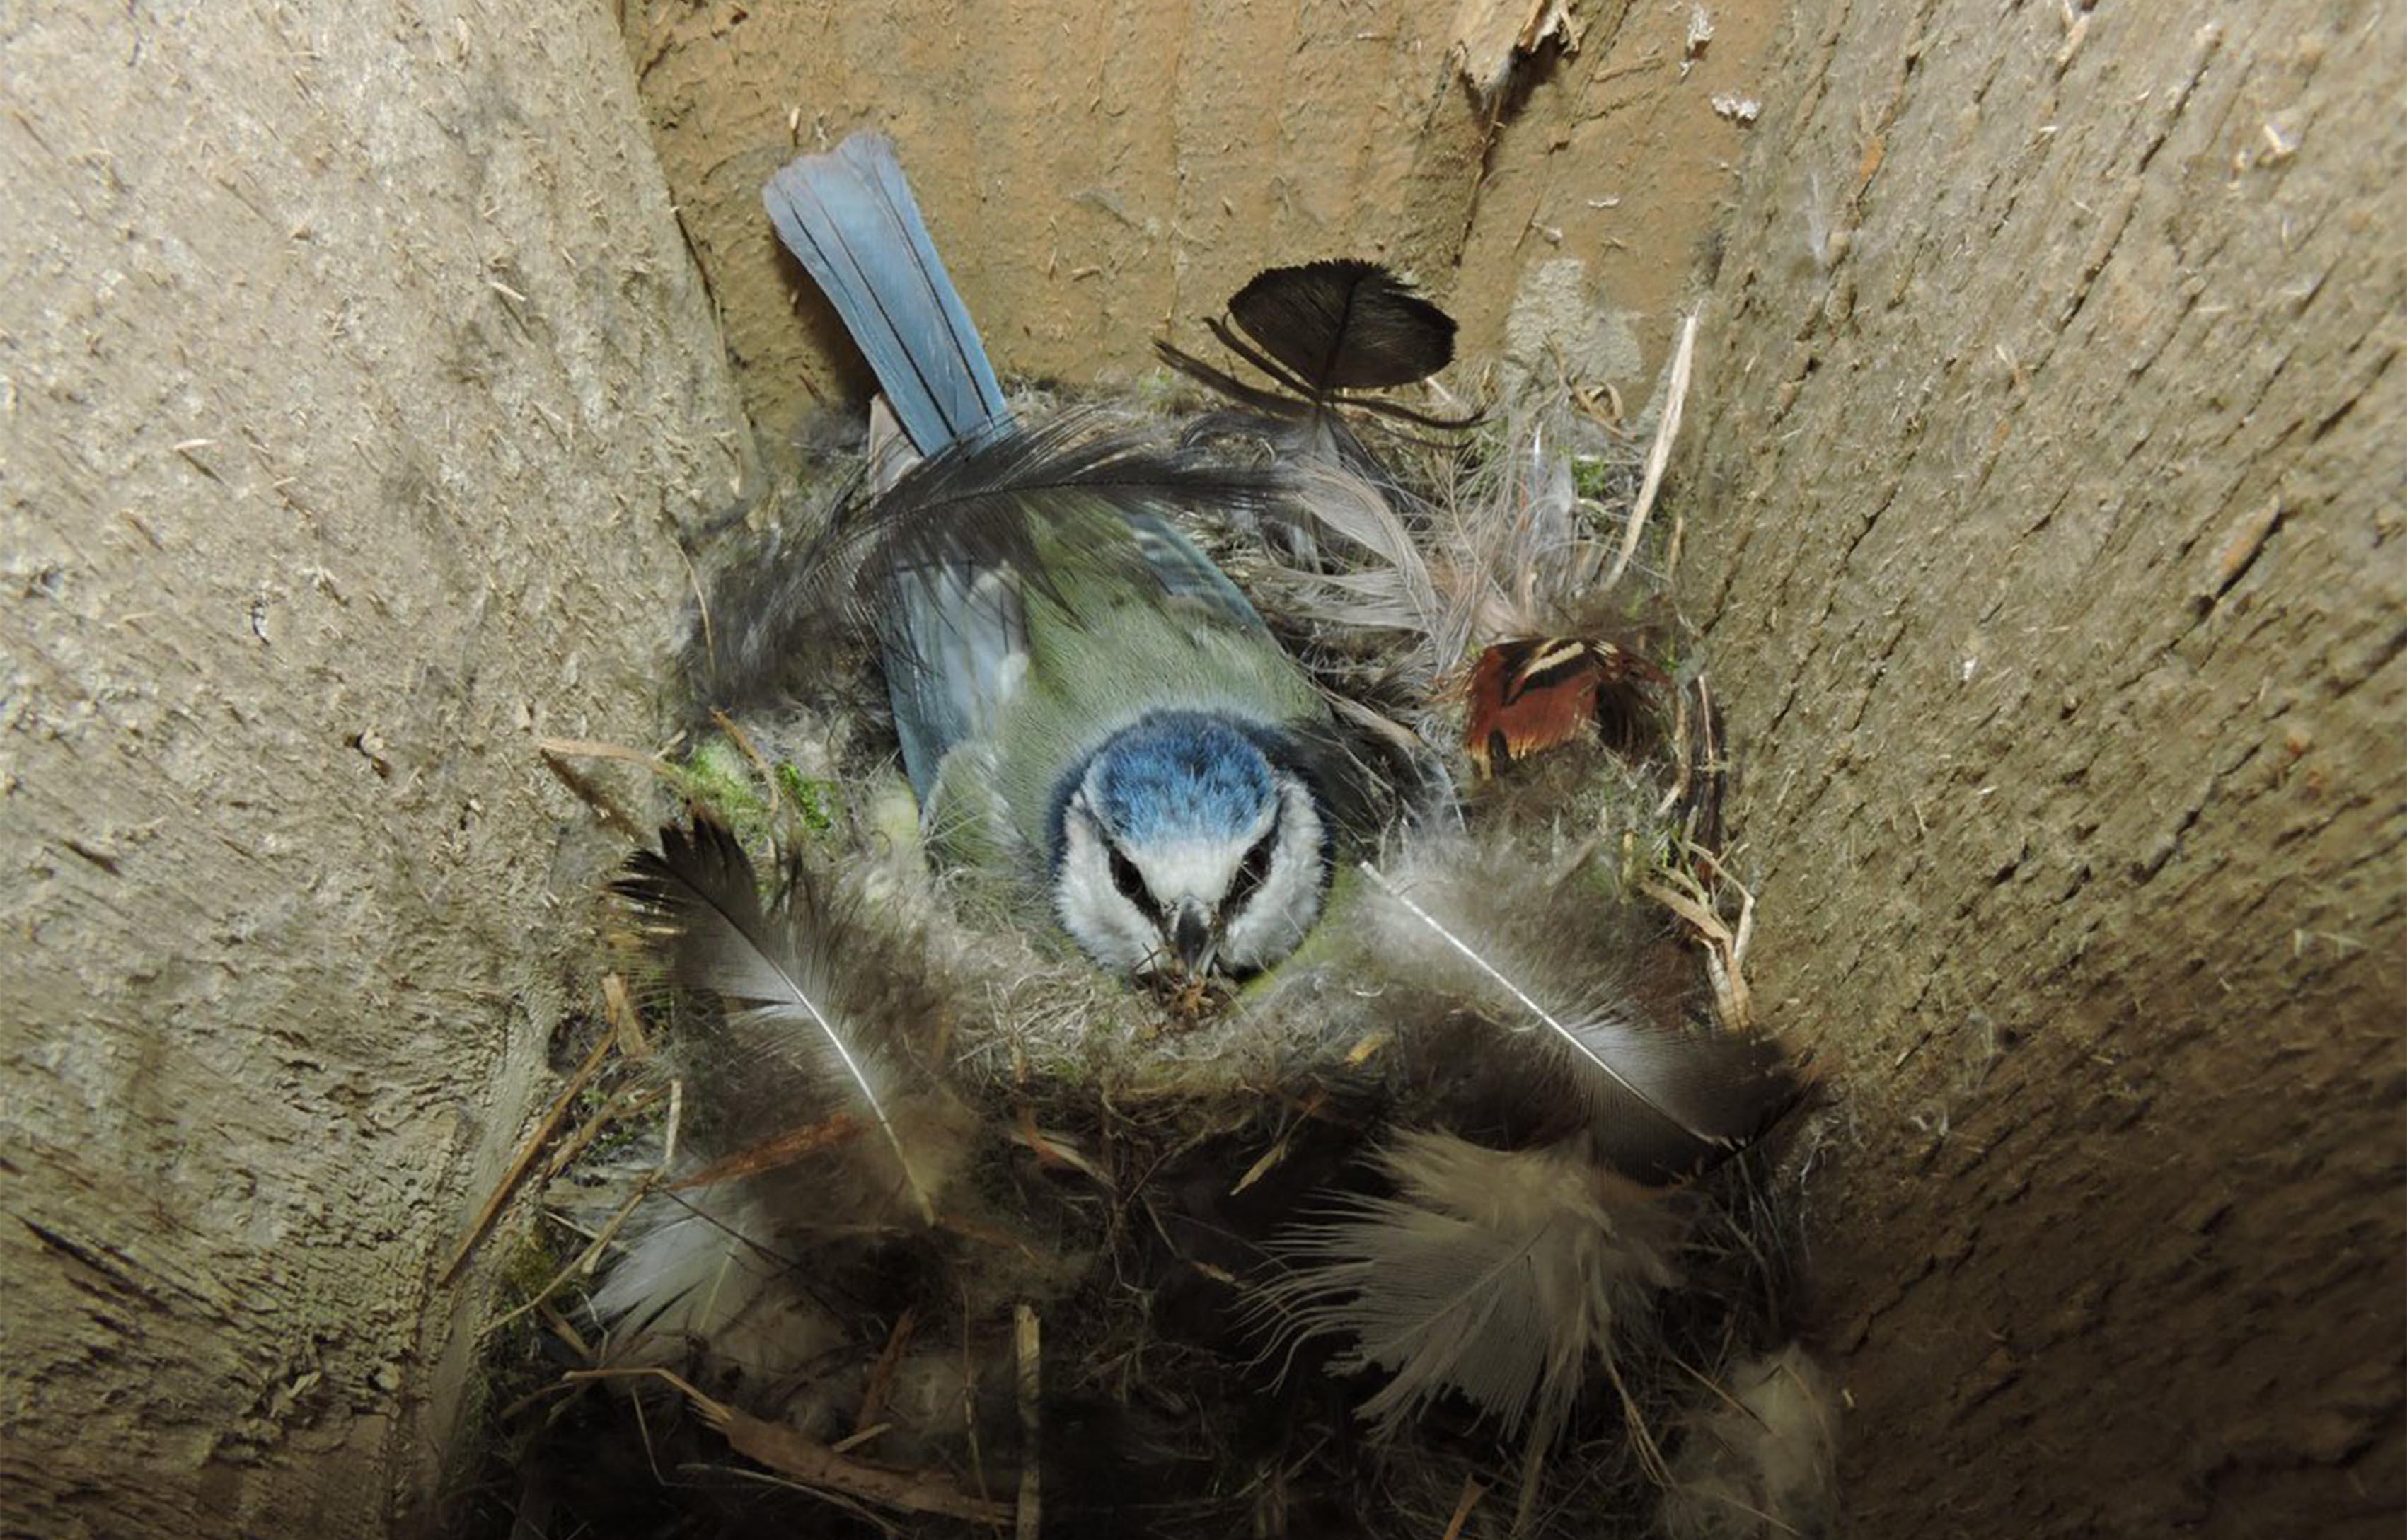 Nesting blue tit at Purdis Heath